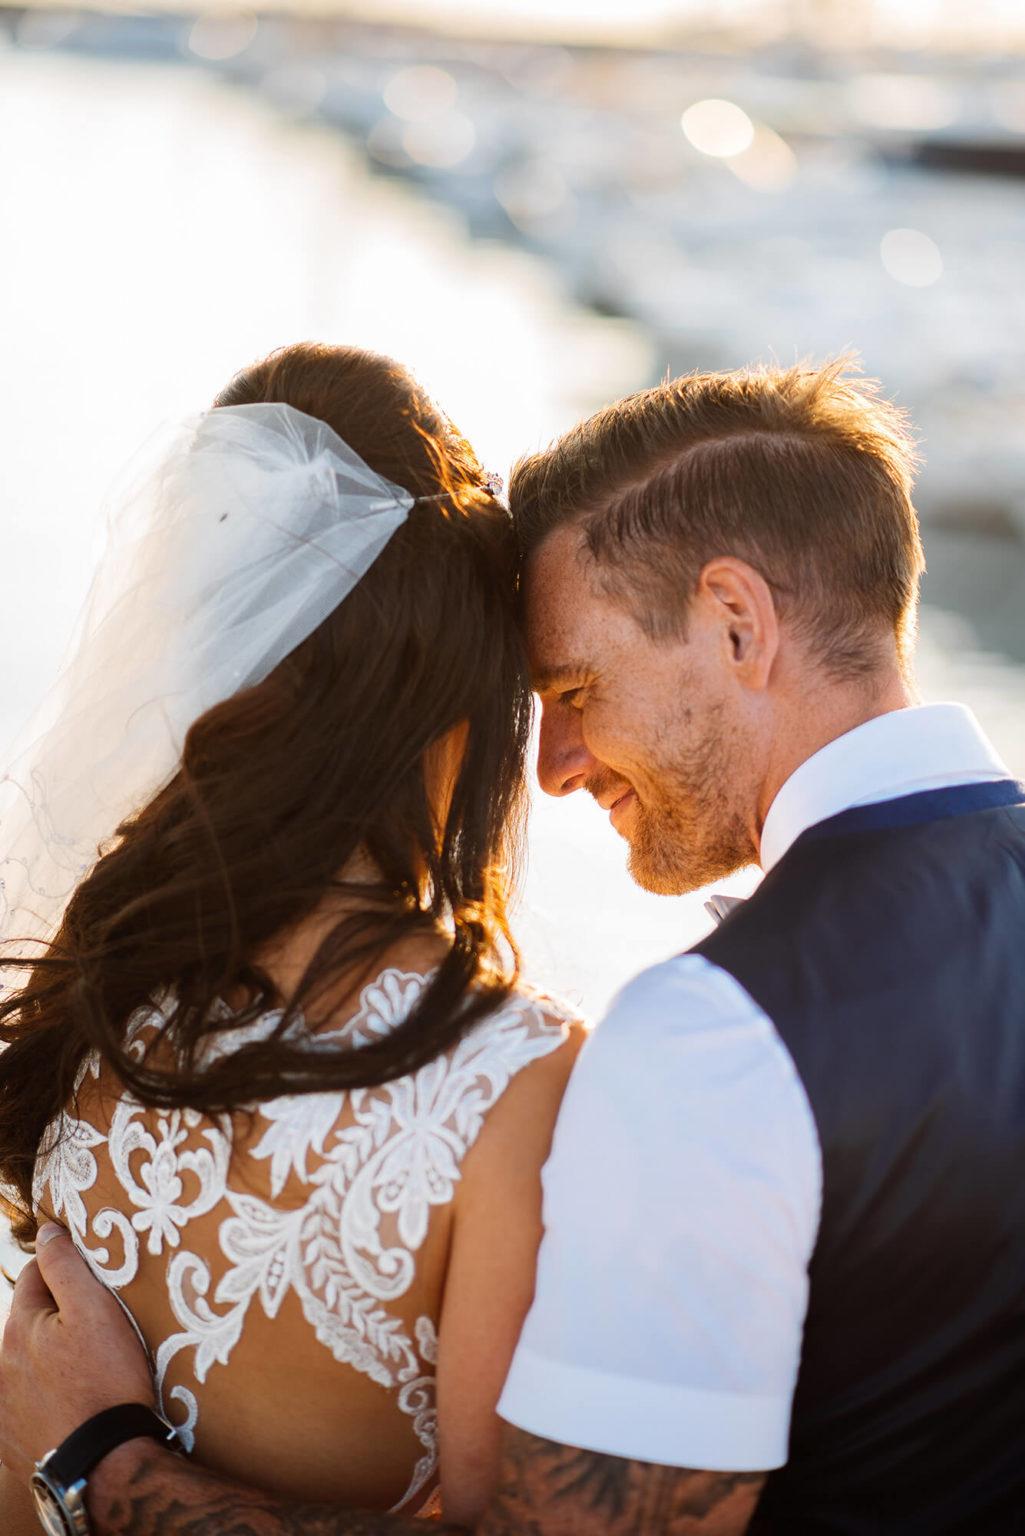 https://www.white-ibiza.com/wp-content/uploads/2020/03/white-ibiza-weddings-dario-sanz-photography-2020-08-1-1025x1536.jpg